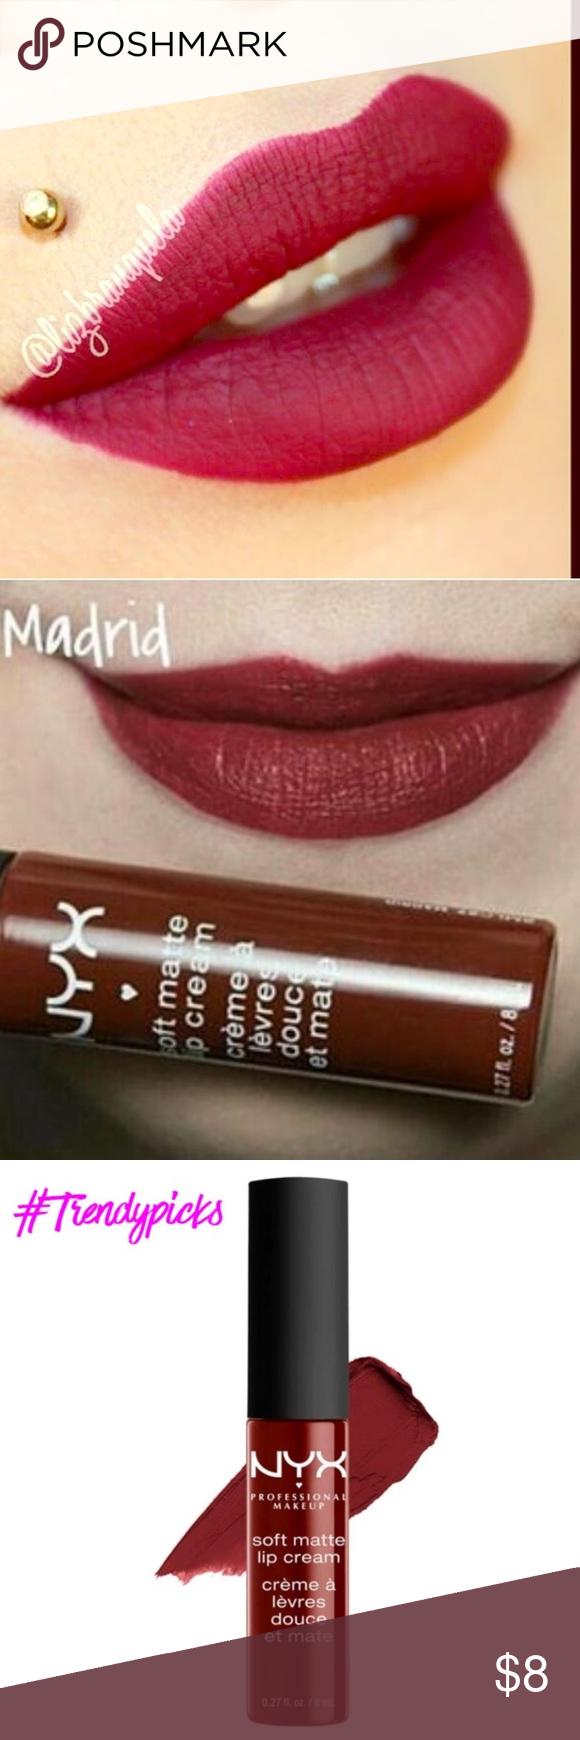 New Nyx Soft Matte Lip Cream In Madrid New Nyx Soft Matte Lip Cream